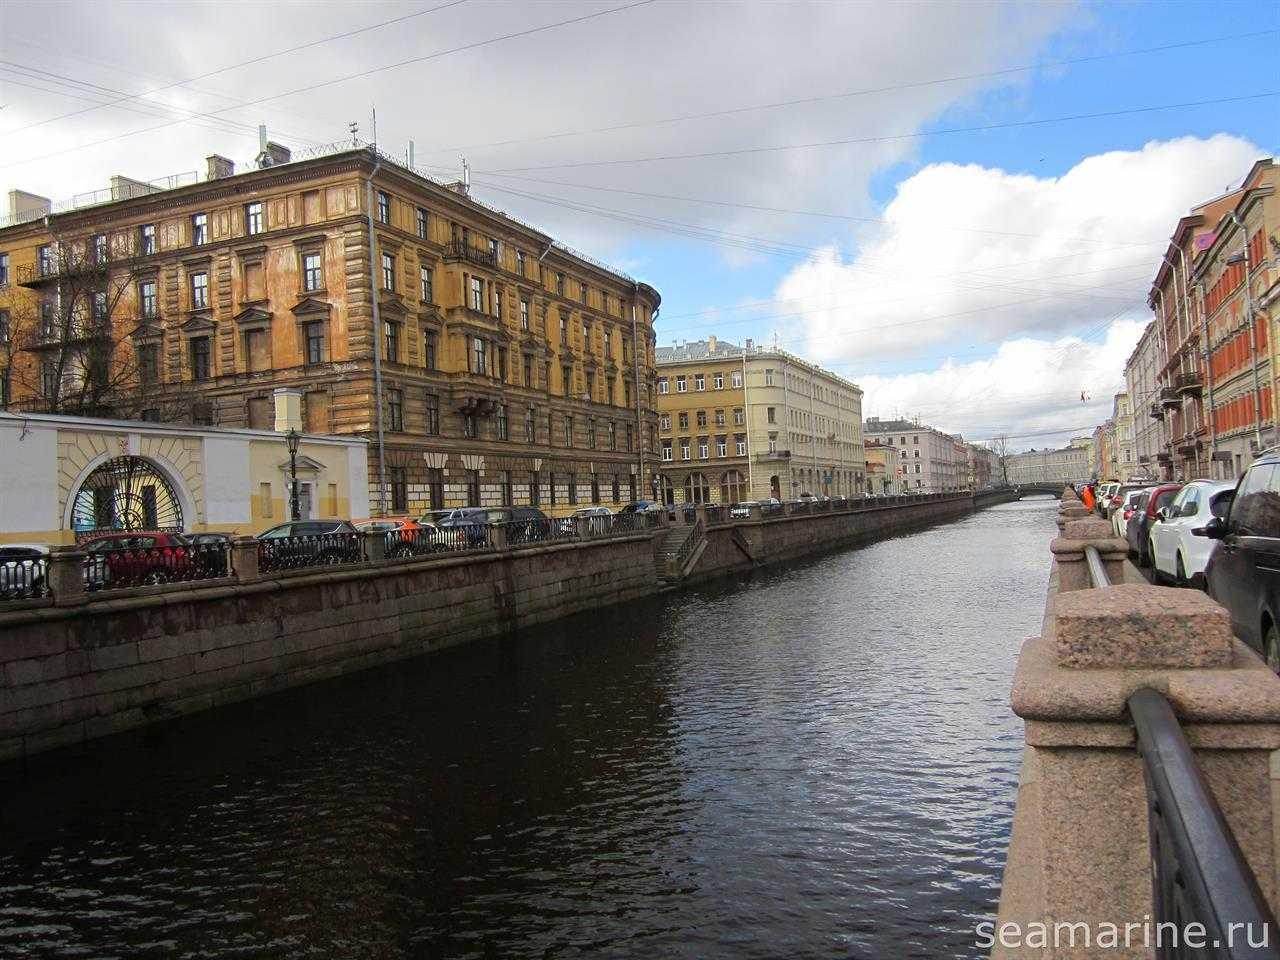 Санкт-Петербург. Набережная канала Грибоедова